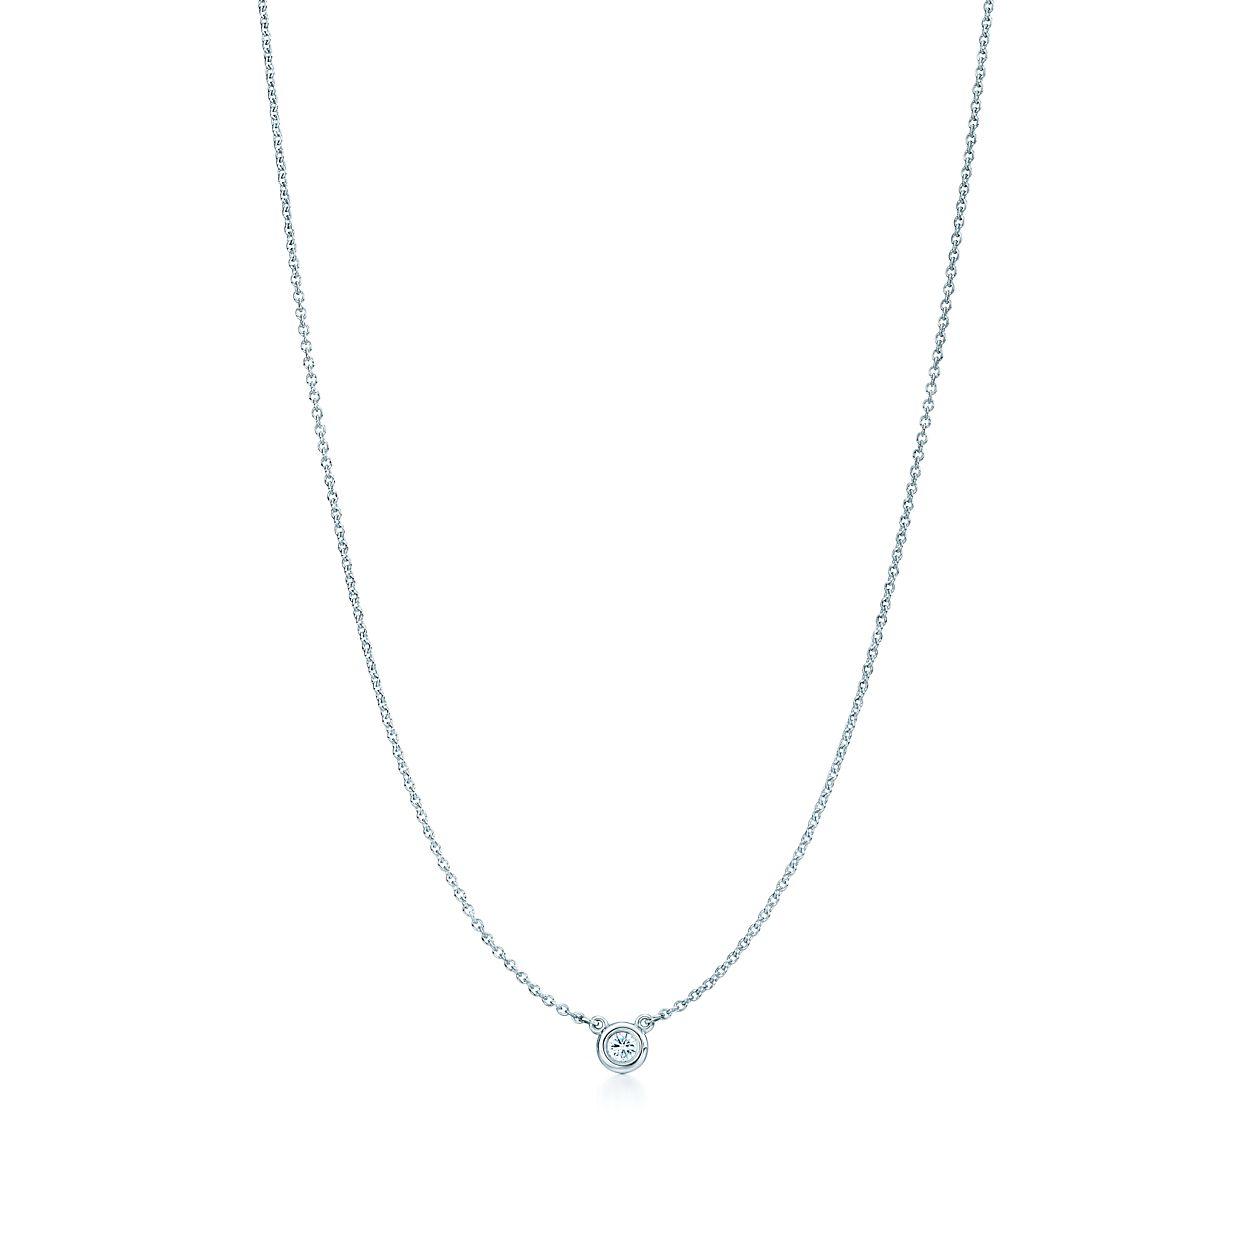 Elsa Peretti Diamonds By The Yard Pendant